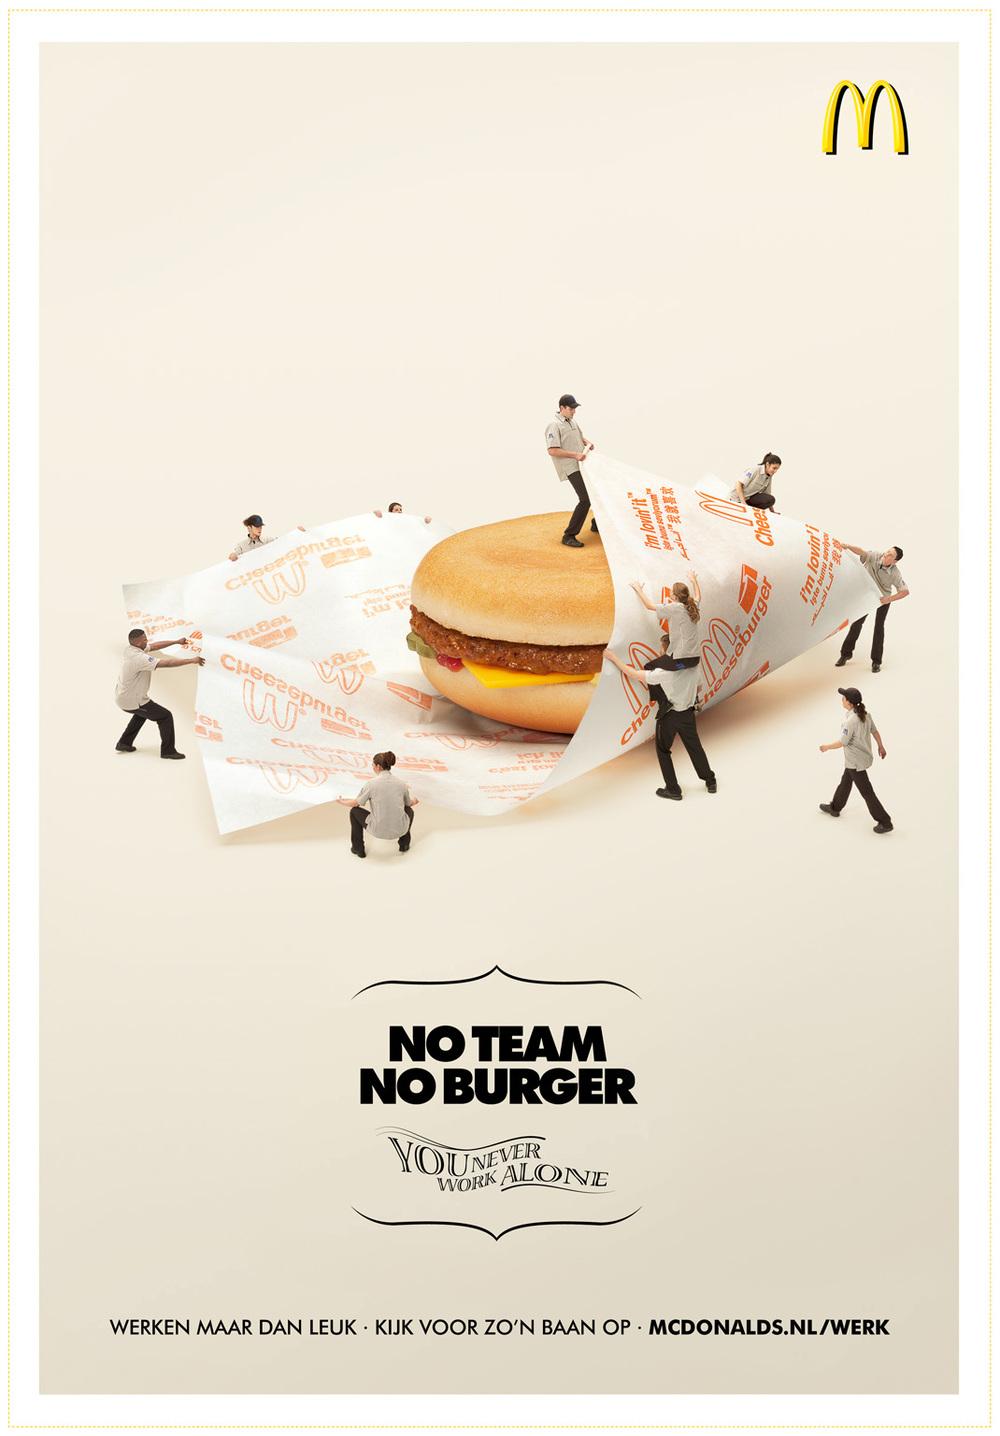 mcd_burger_ad.jpg